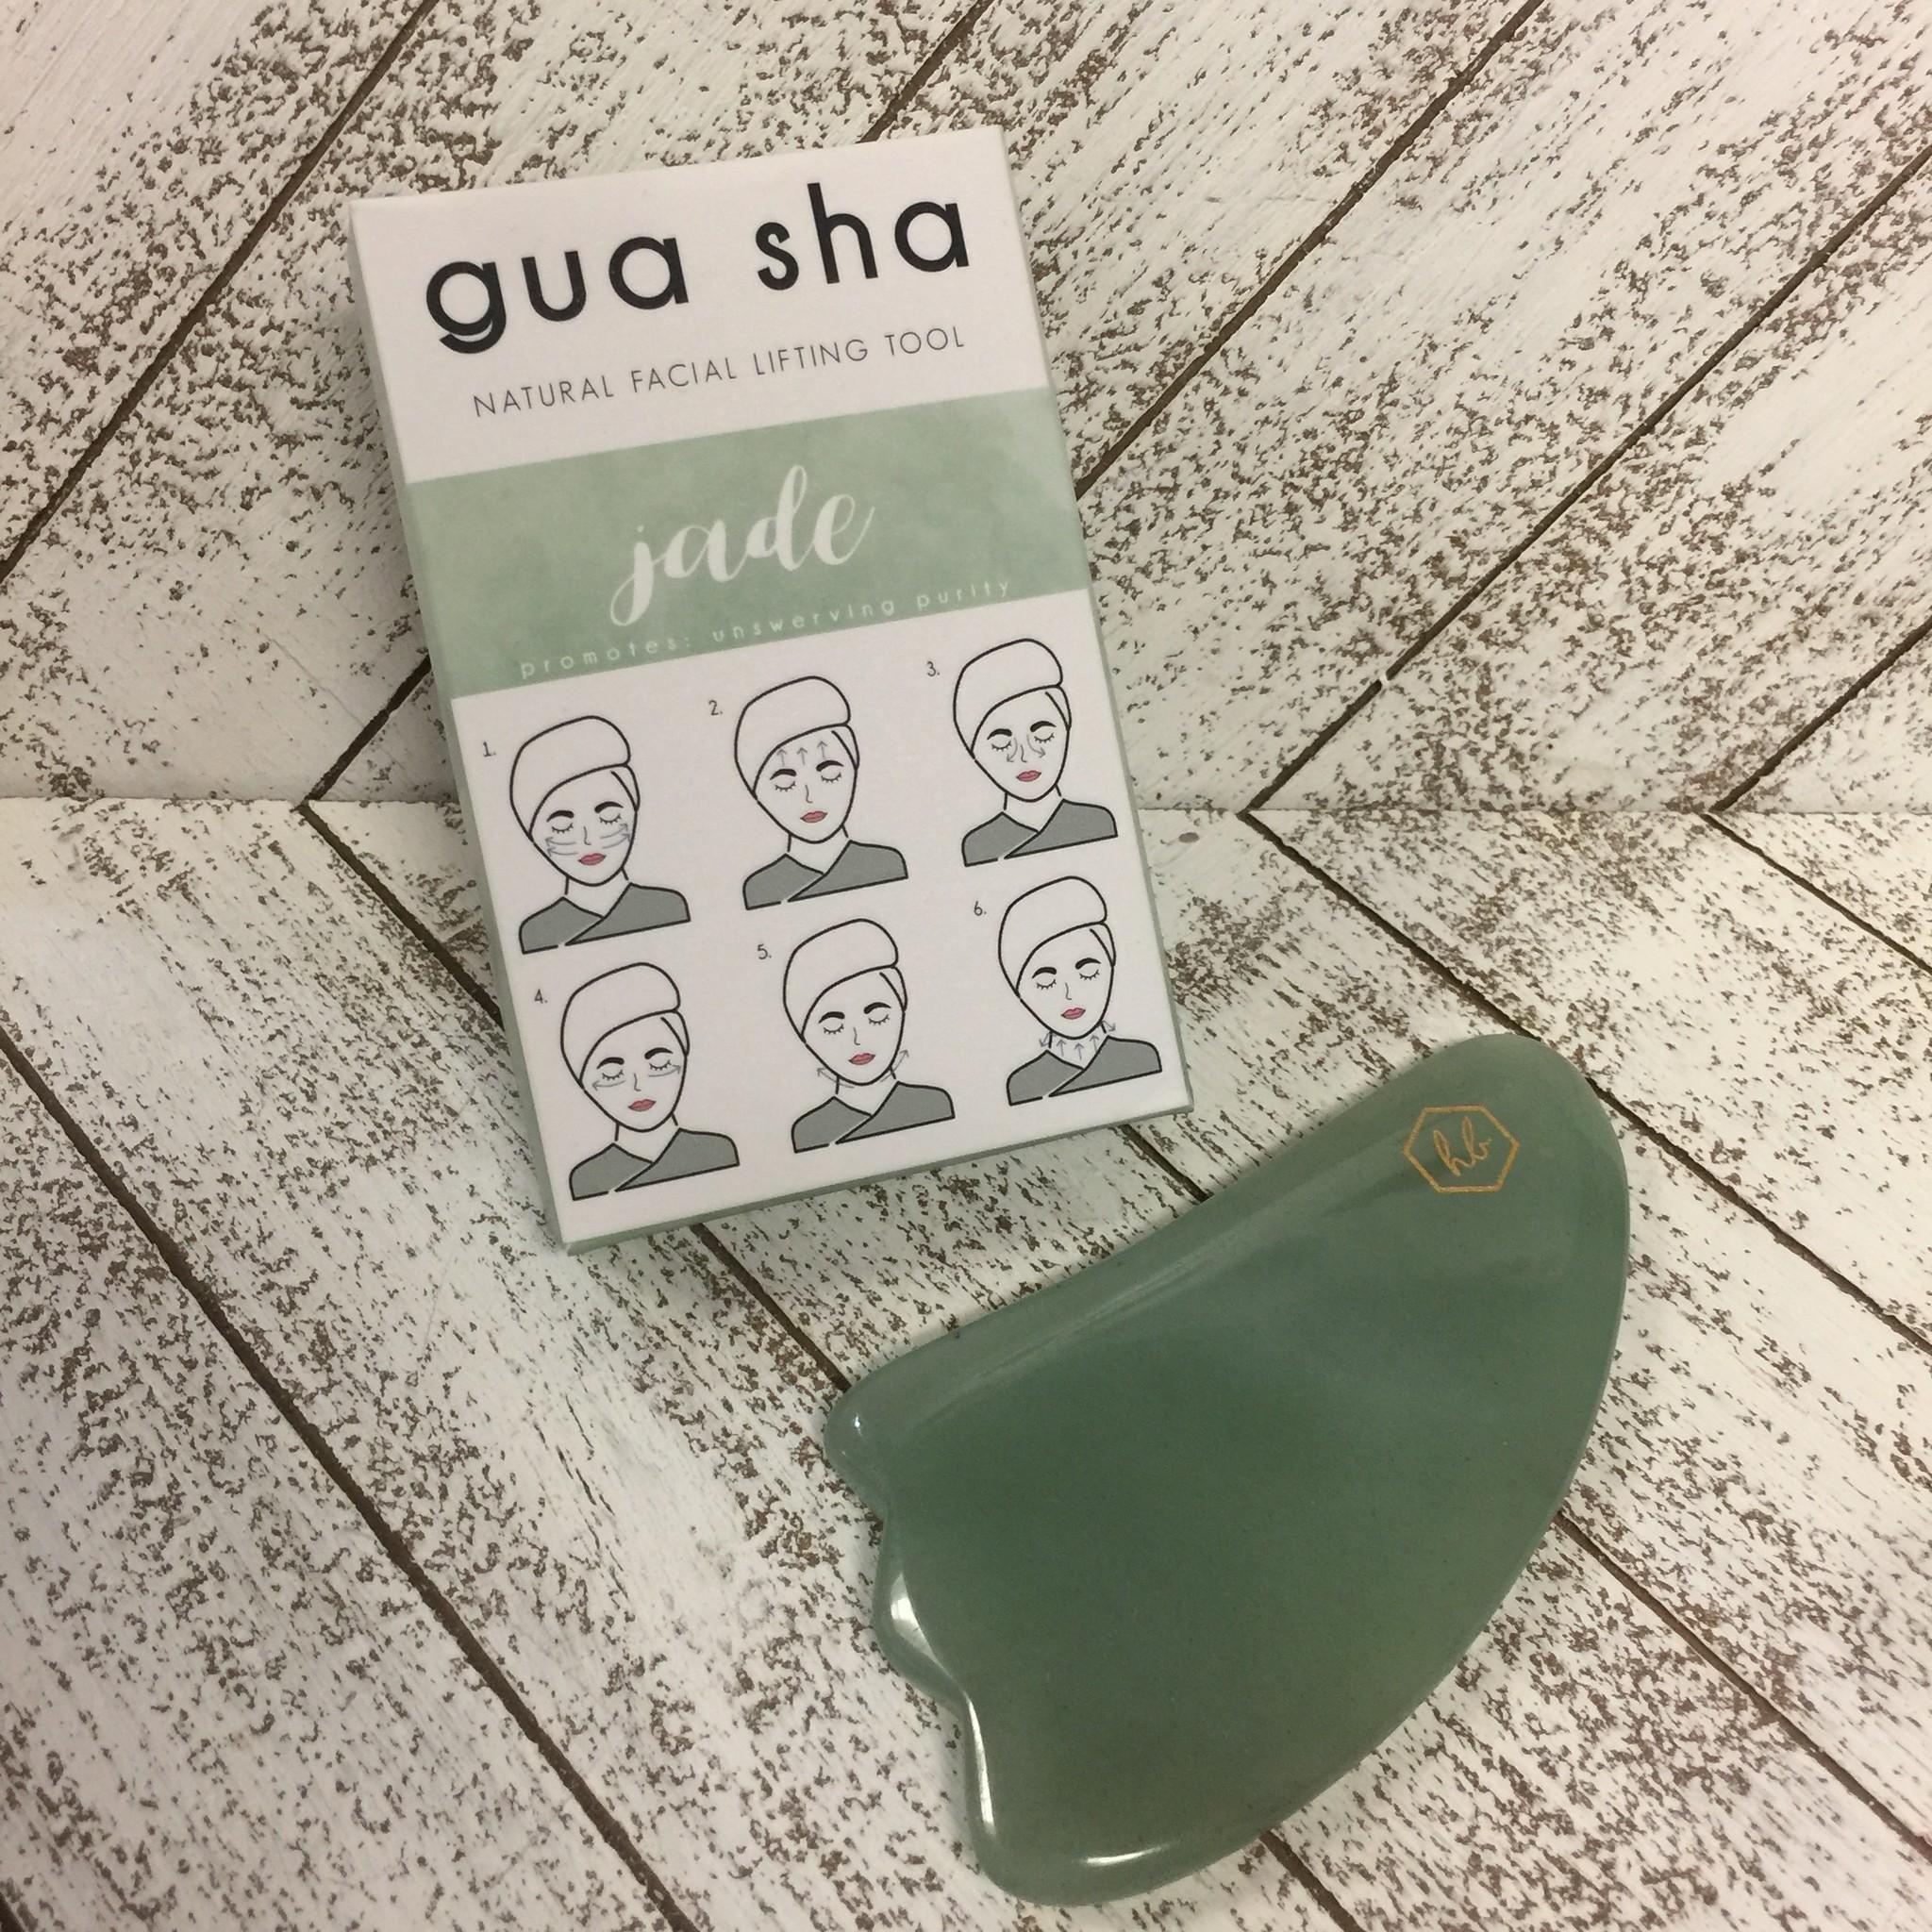 Honey Belle Facial Massage Tool - Jade Gua Sha